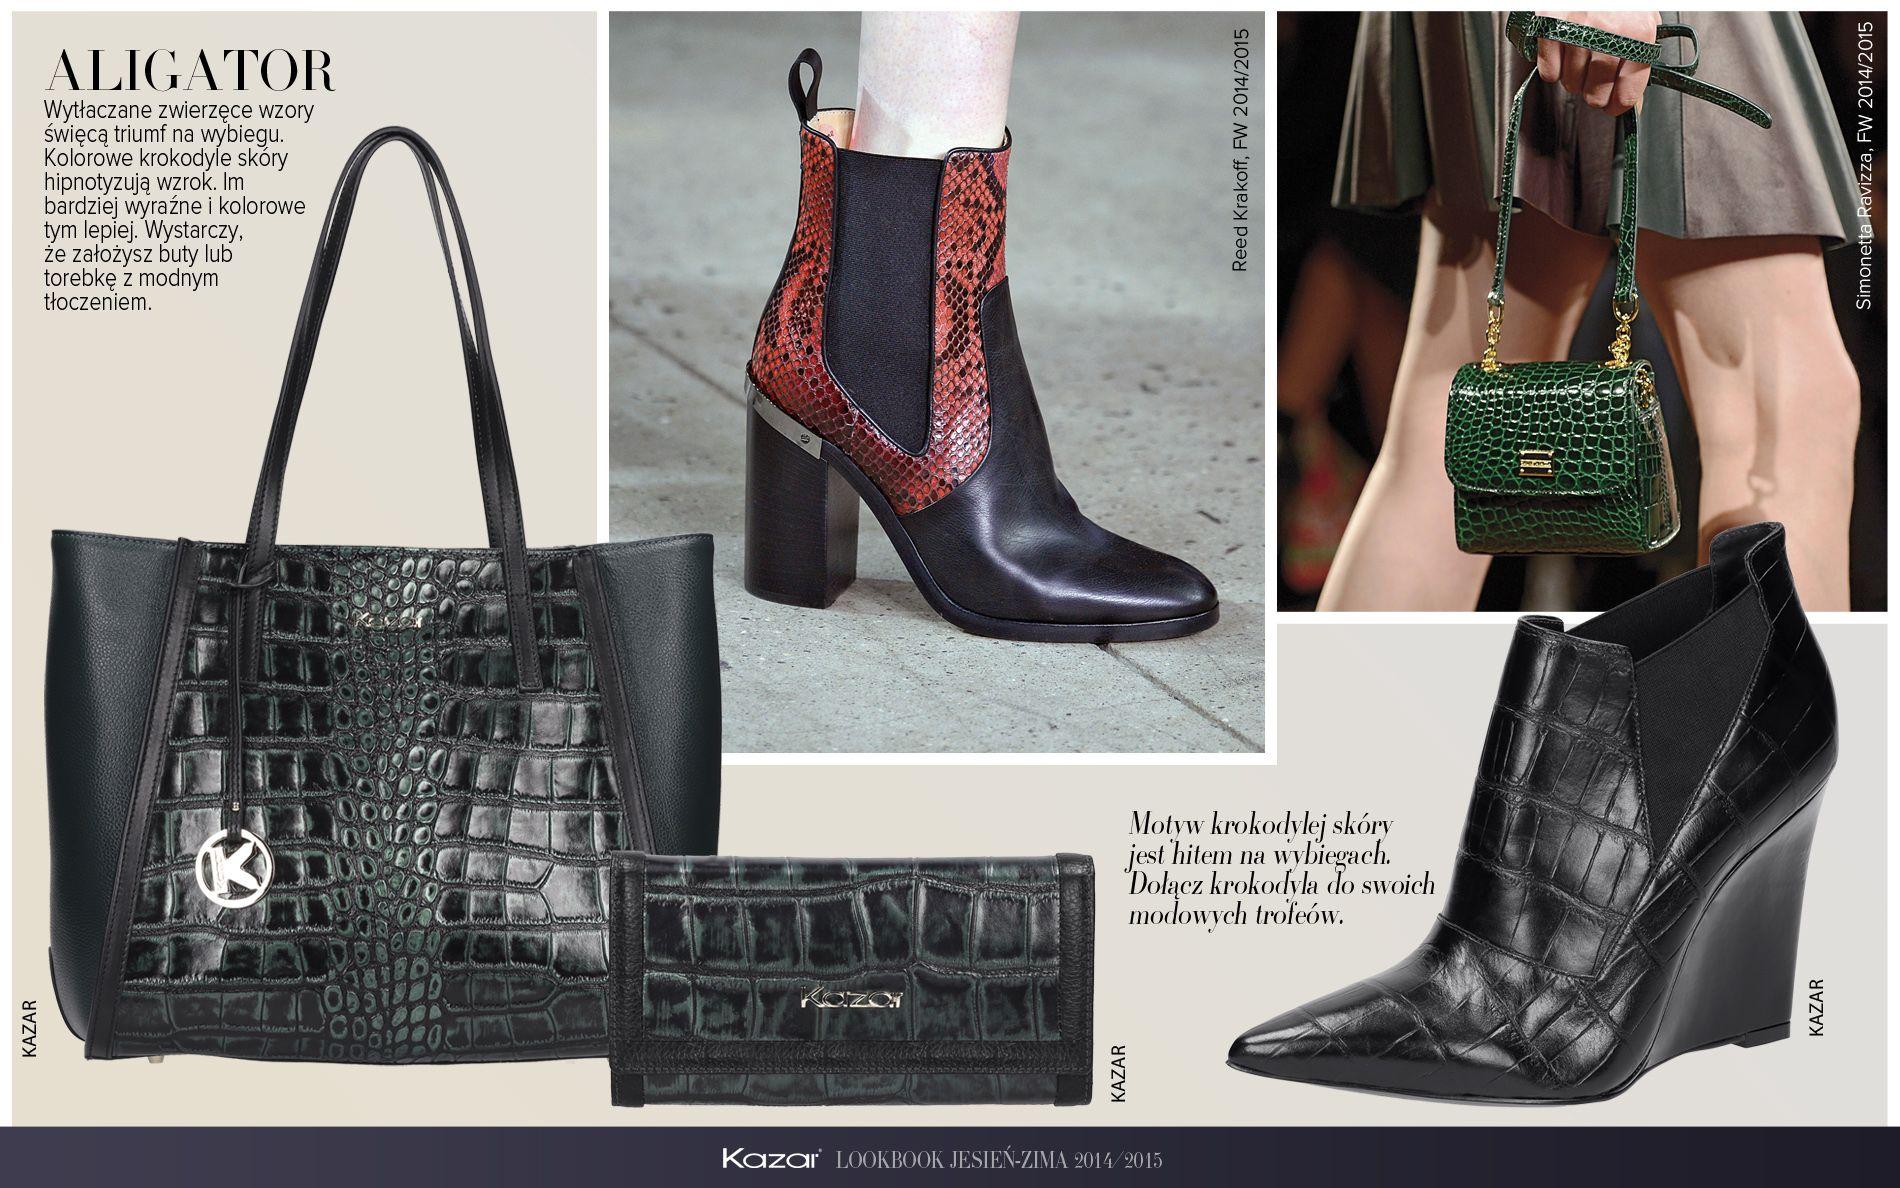 Aligator Wiecej Na Www Kazar Com Kazar Fashion Heels Szpilki Animal Inspiration Look New Boots Black Bag Autumn Winter Boots Ankle Boot Shoes